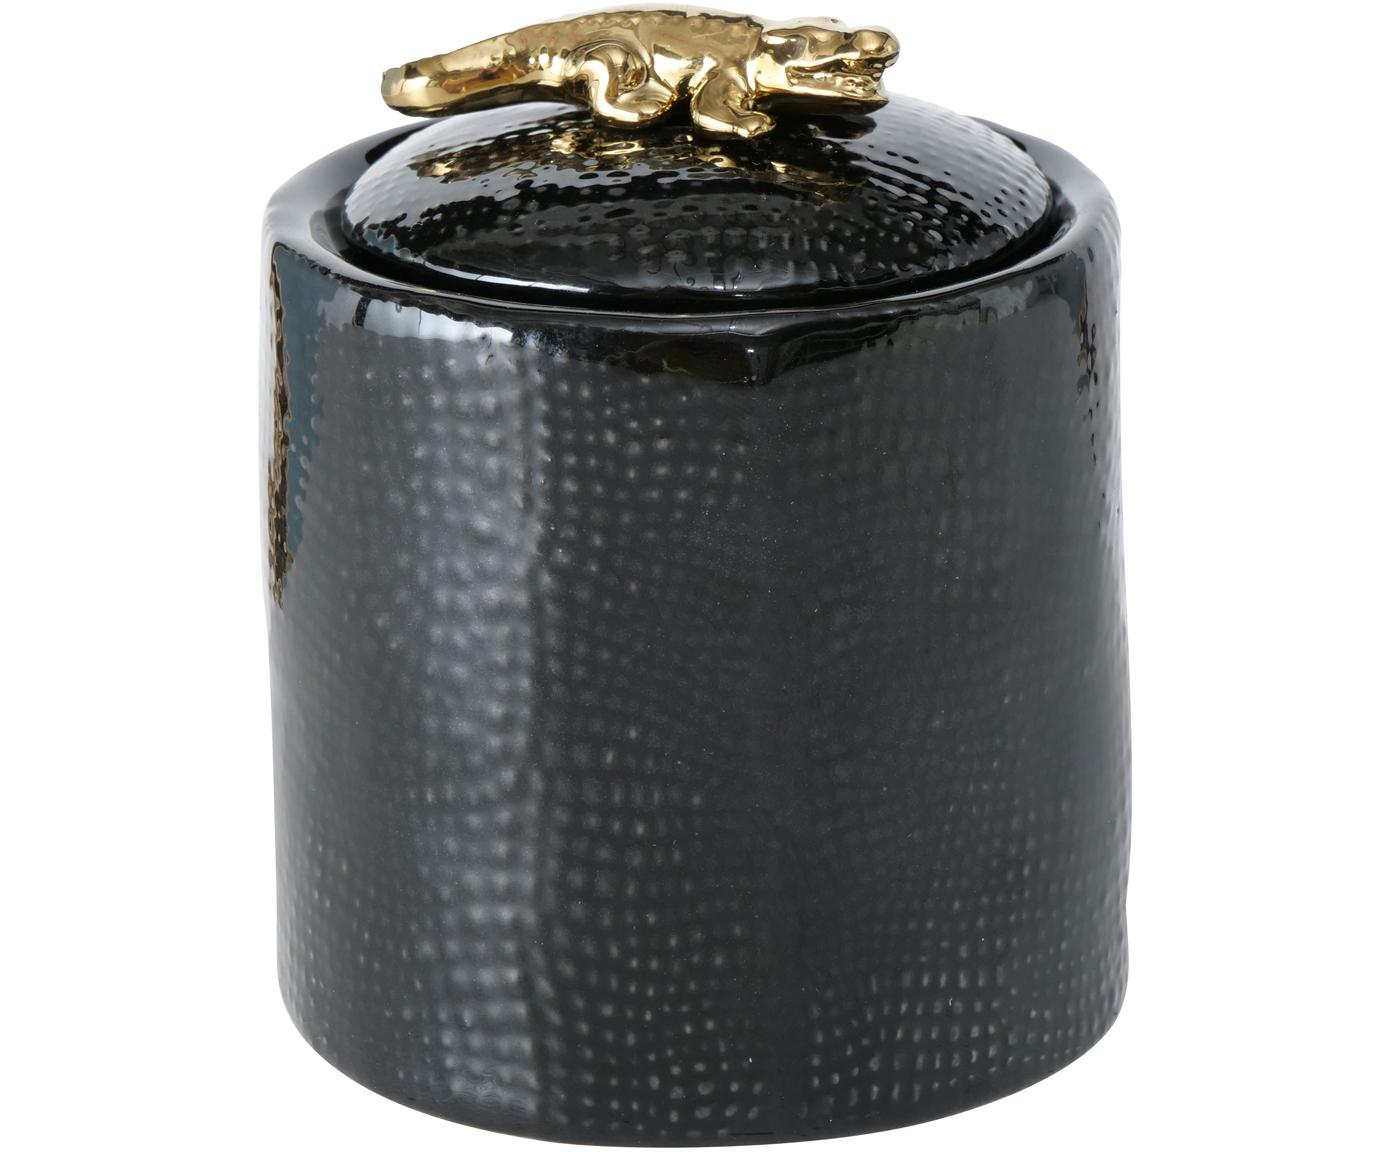 Schmuckdose Kroko, Porzellan, Schwarz, Ø 9 x H 11 cm